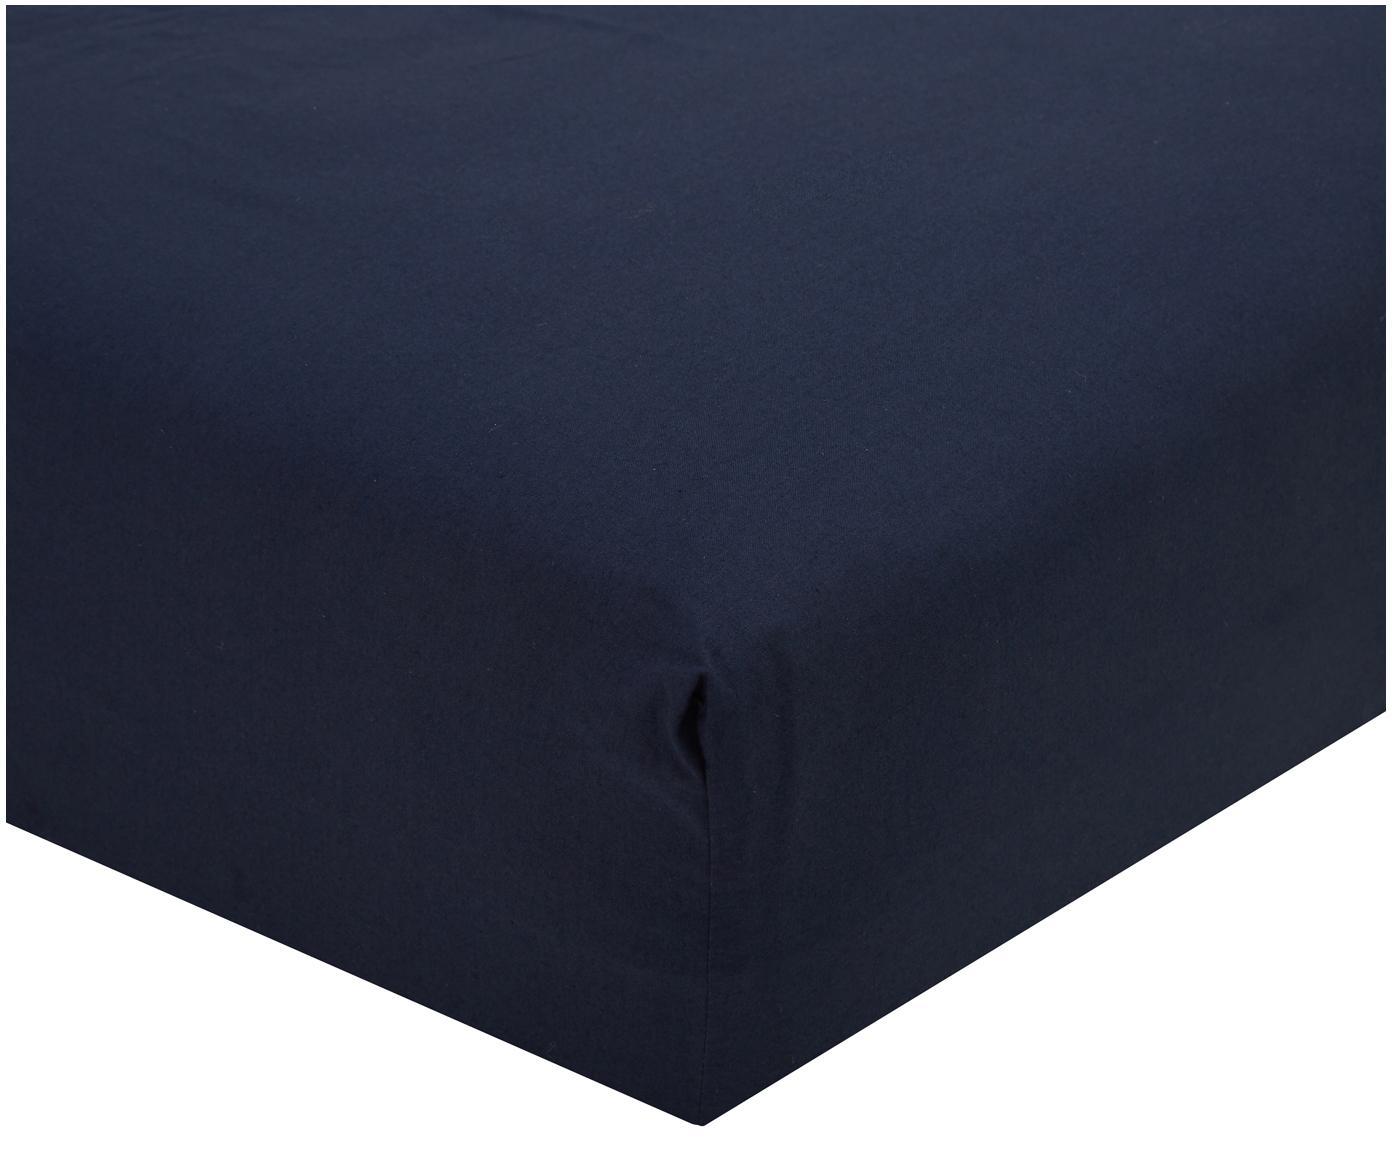 Lenzuolo con angoli in percalle Elsie, Tessuto: percalle, Blu scuro, 90 x 200 cm